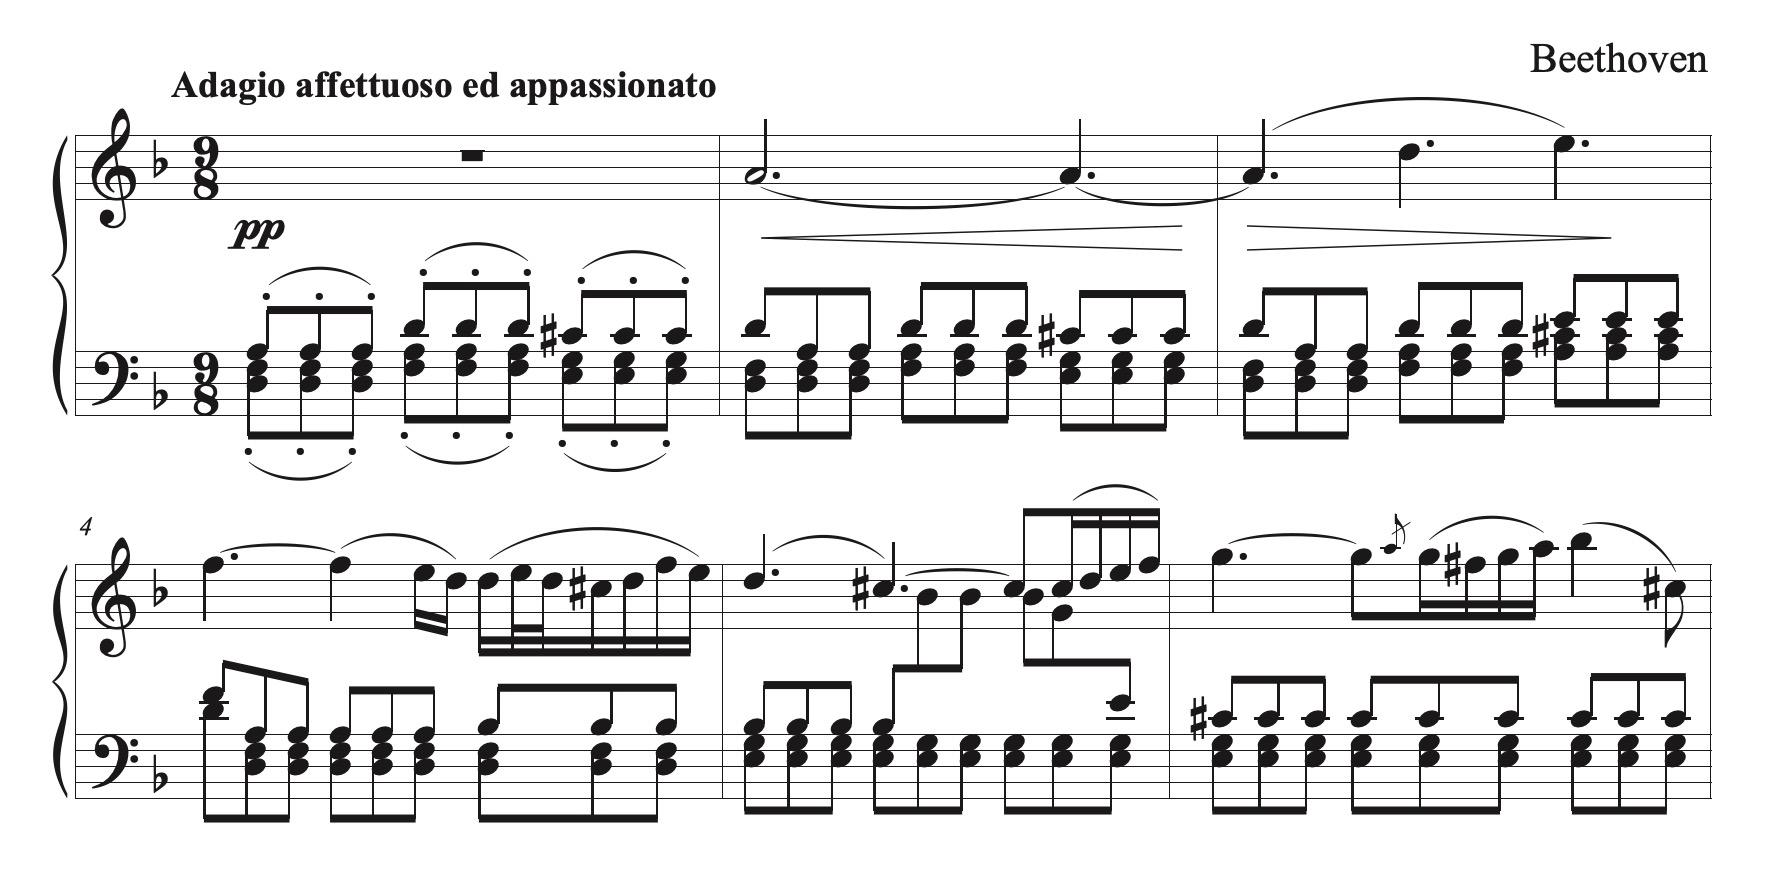 Beethoven op.18 no.1 Adagio